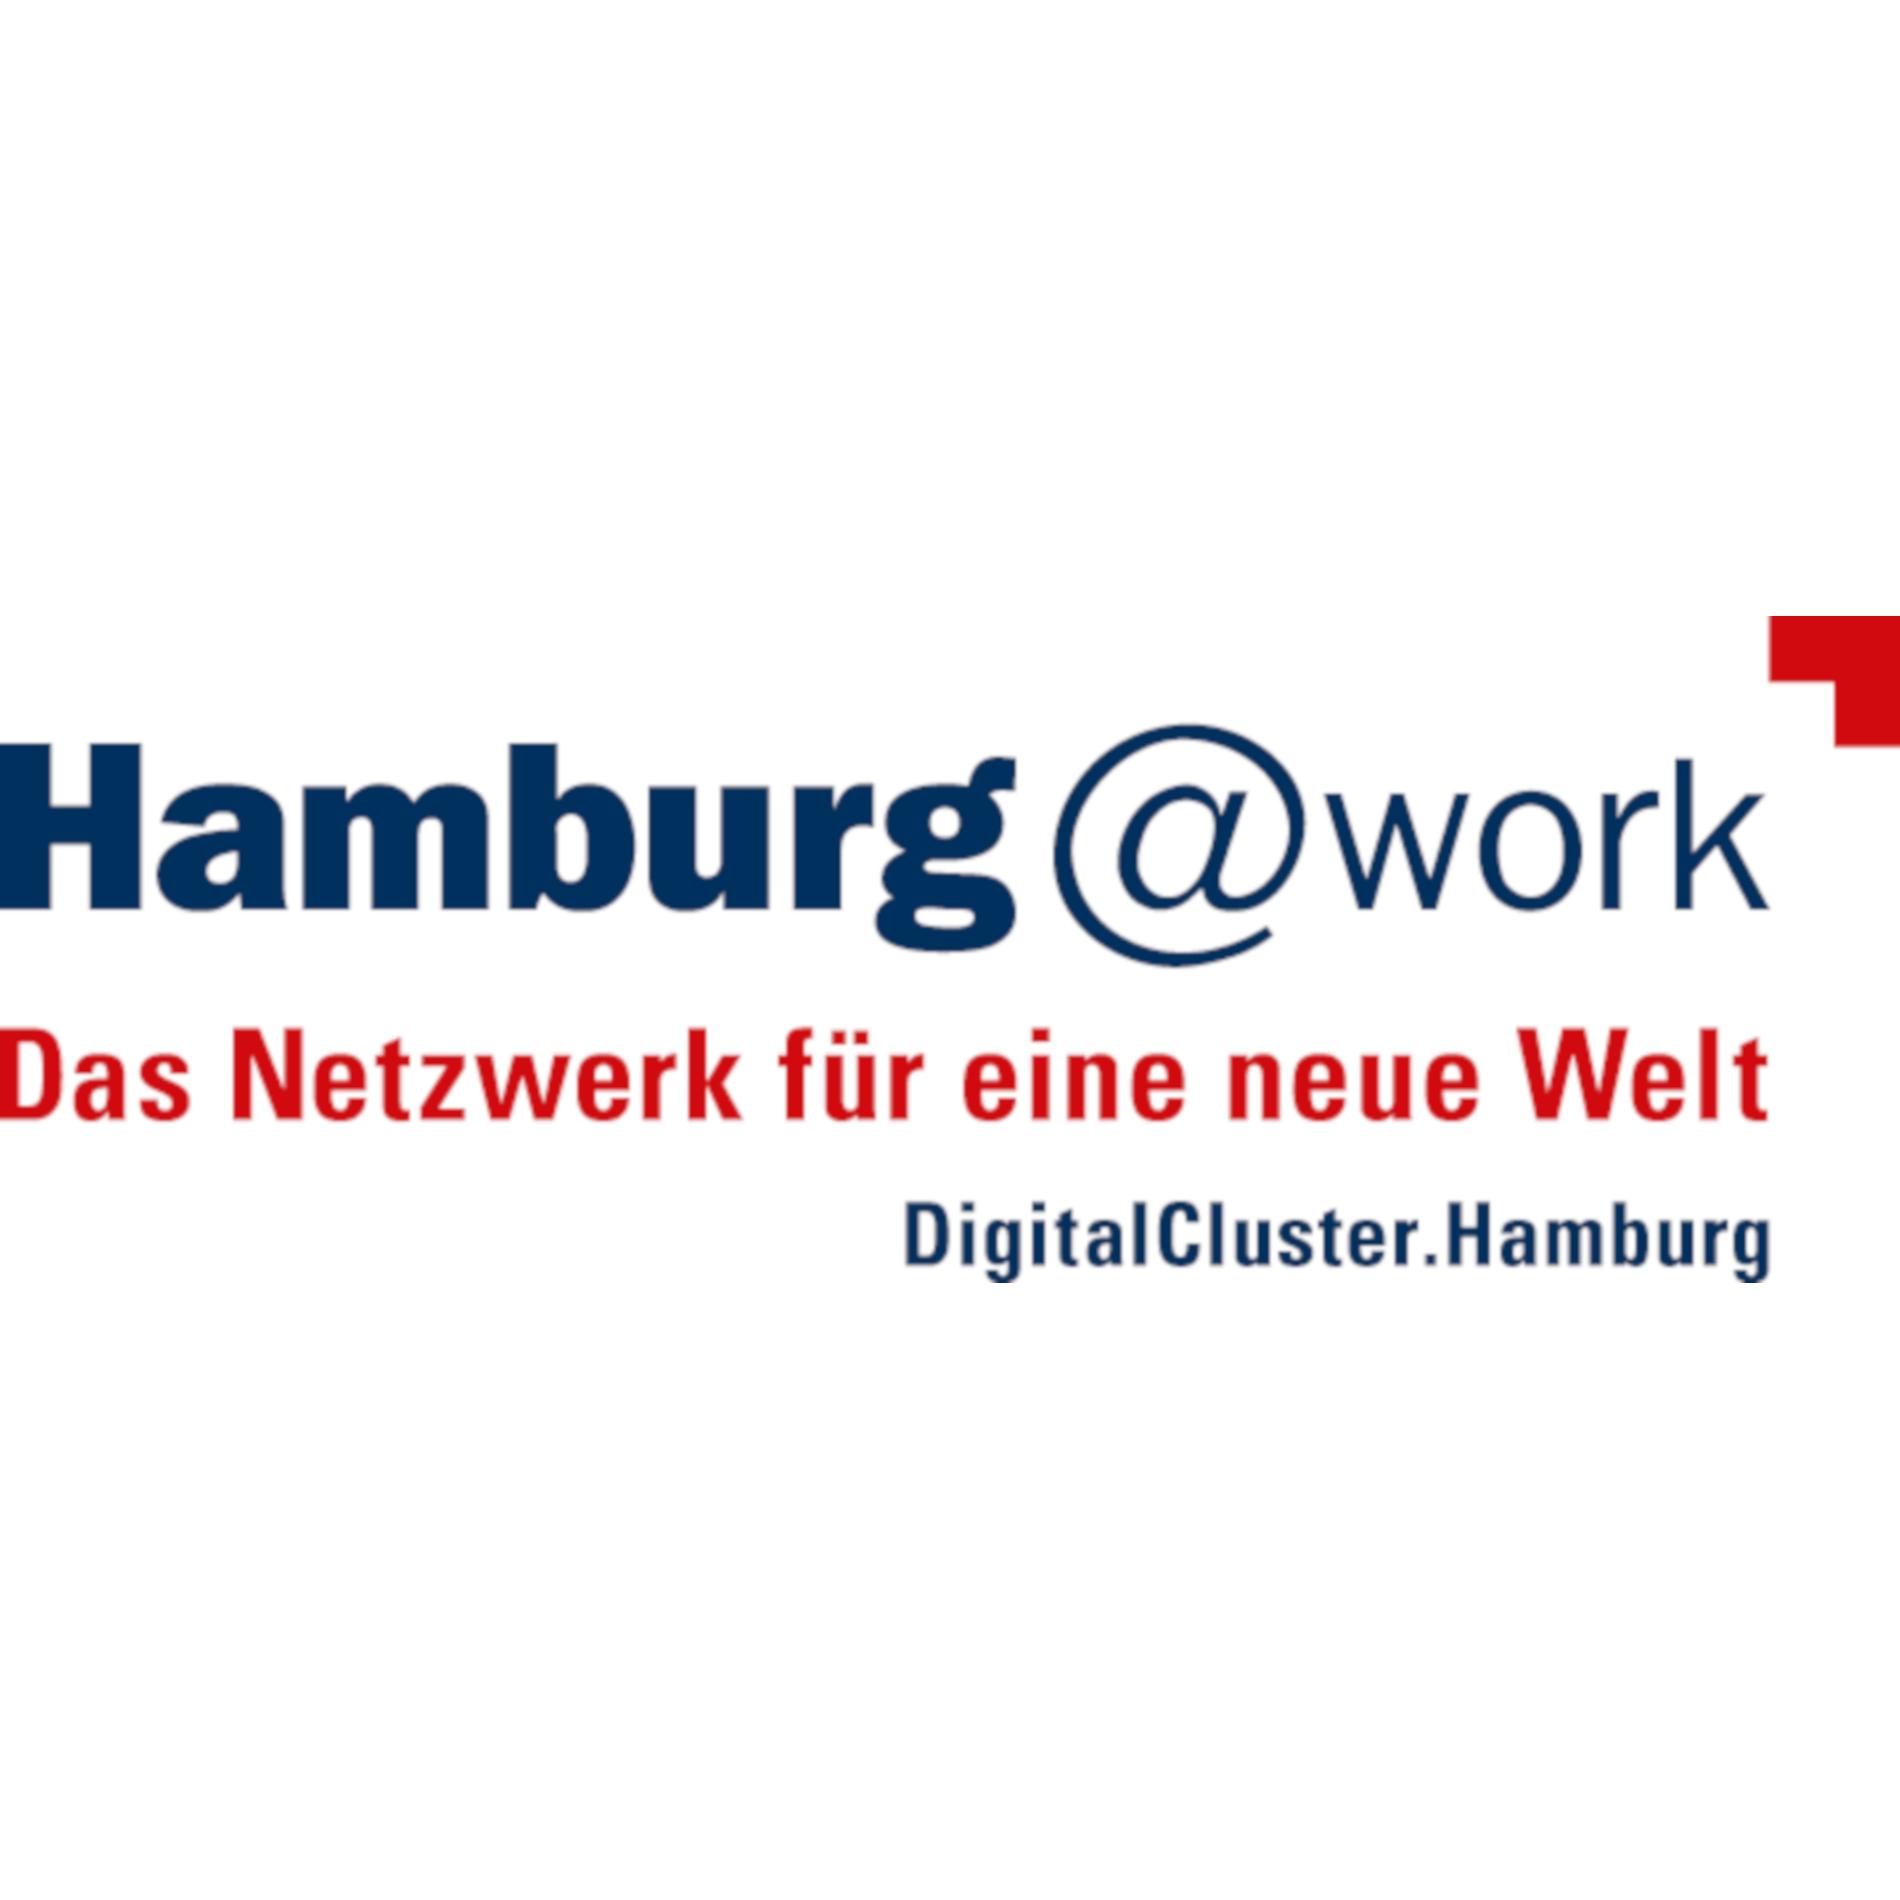 Logo Hamburg@work